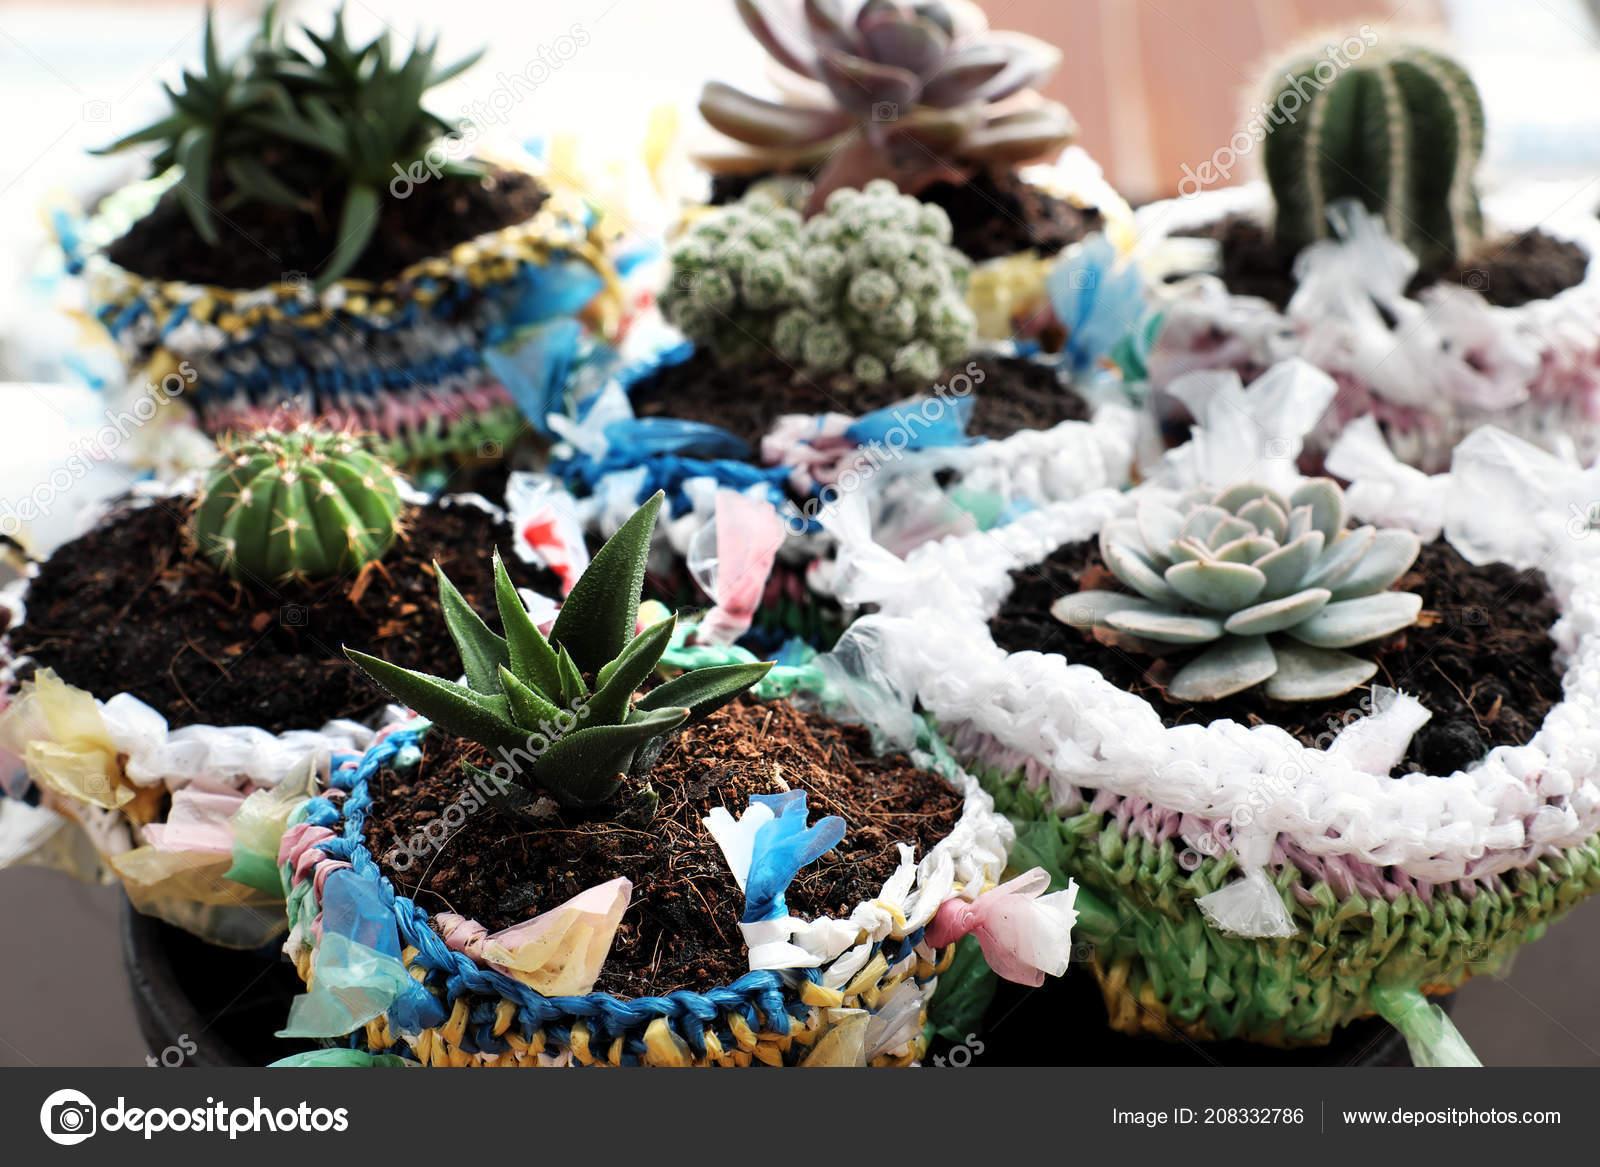 86ce5b2dbb Απίστευτο Ανακυκλωμένο Προϊόν Από Νάιλον Τσάντα Καλή Ιδέα Ανακύκλωσης Από–  εικόνα αρχείου